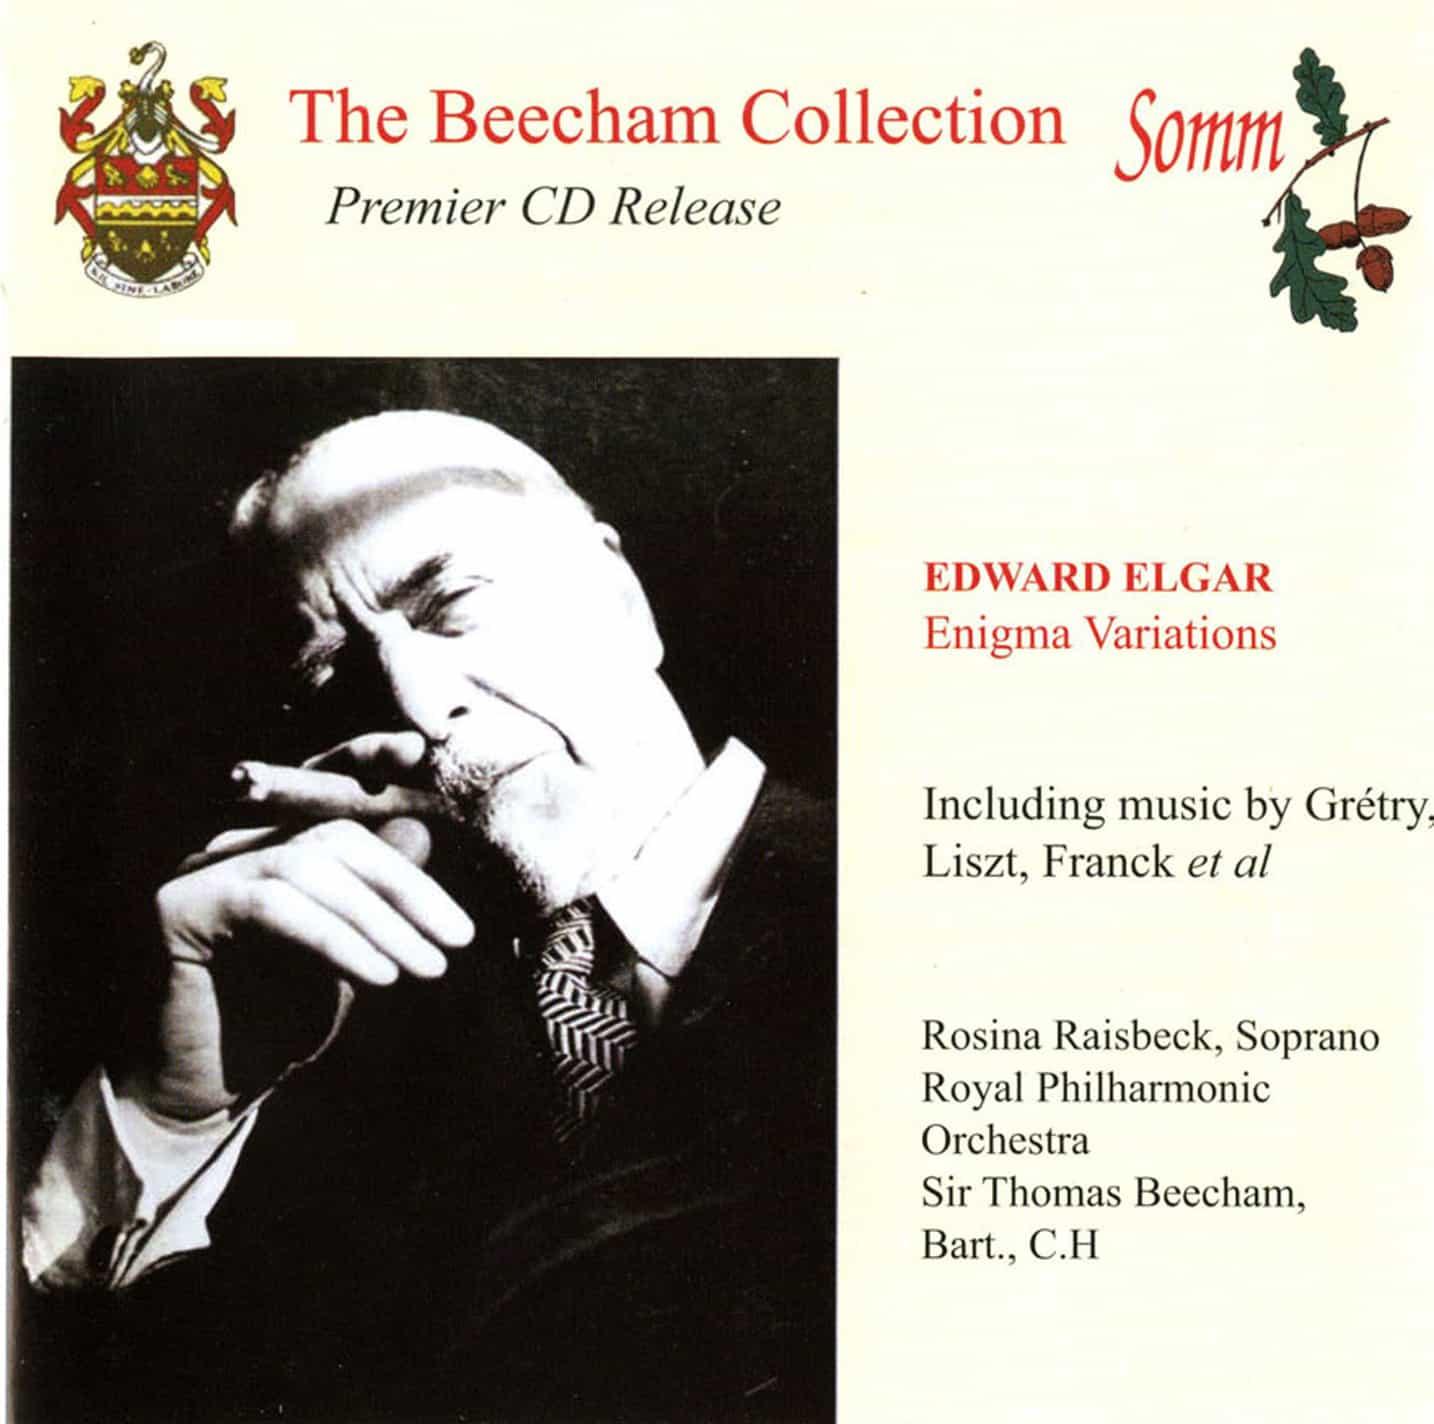 SOMM-BEECHAM 22